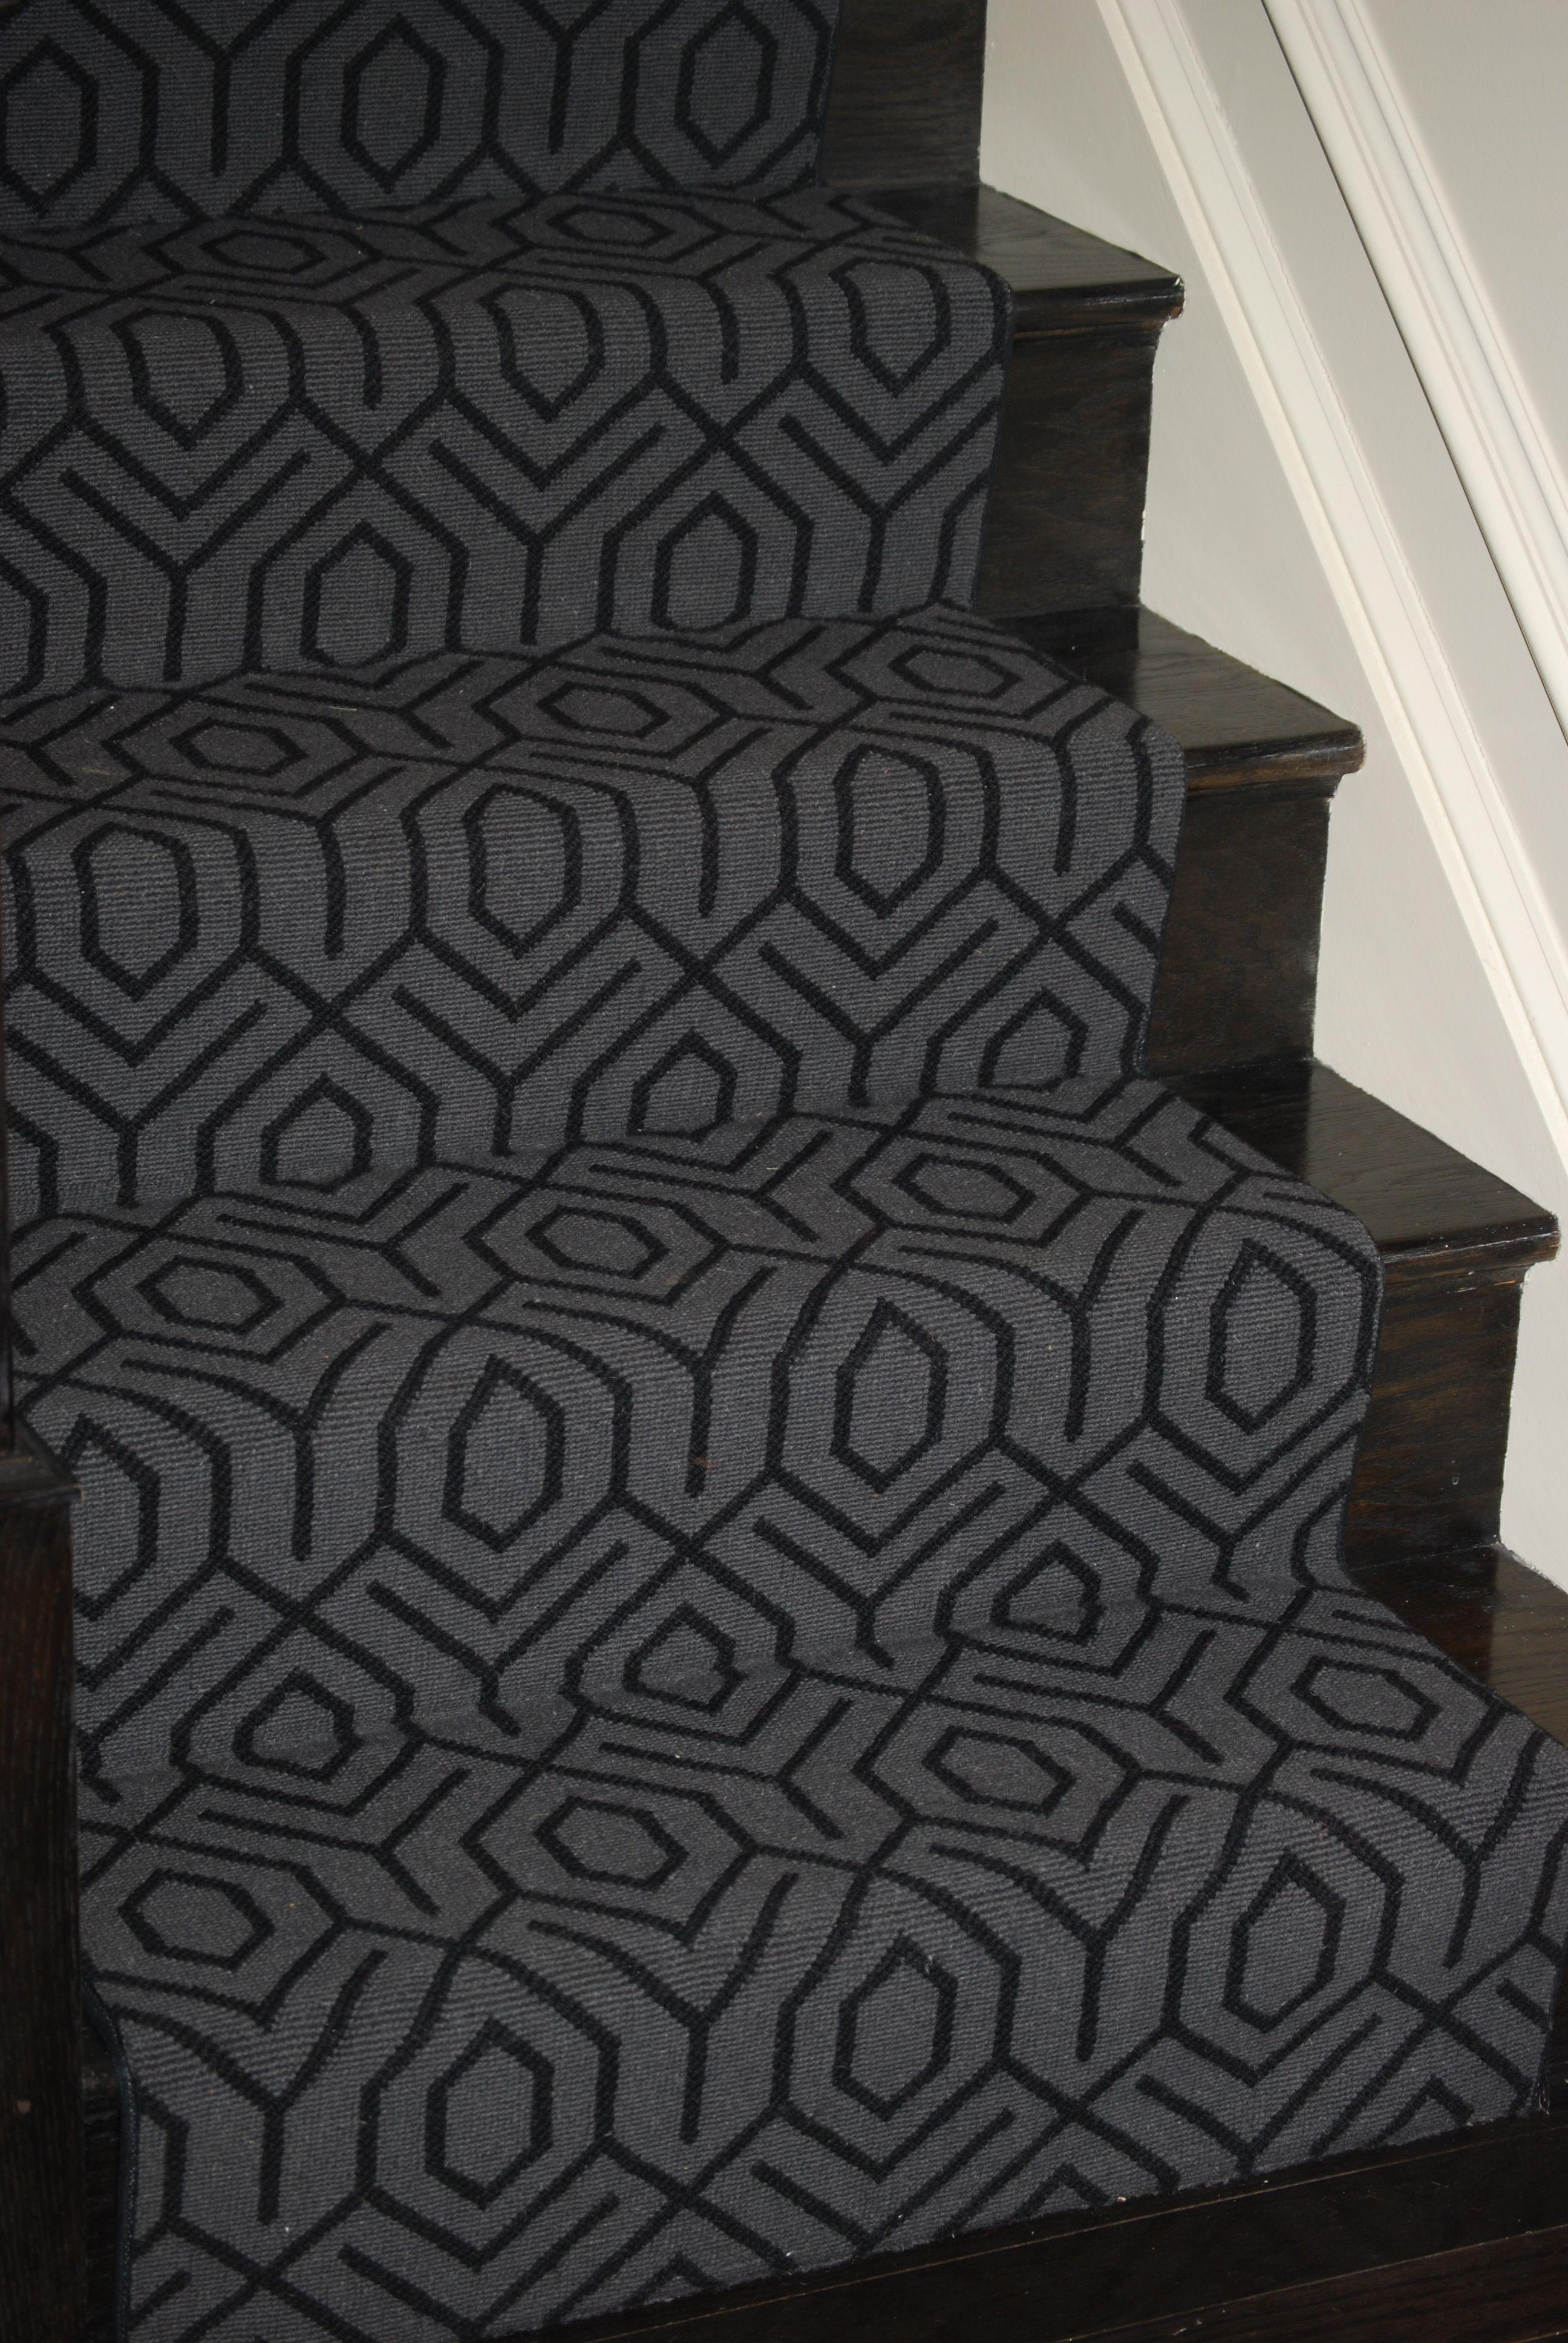 Geometric Stairs Geometric Staircase Melbourne: Stair Runner W/ Geometric; Dark Stain, Dark Rug